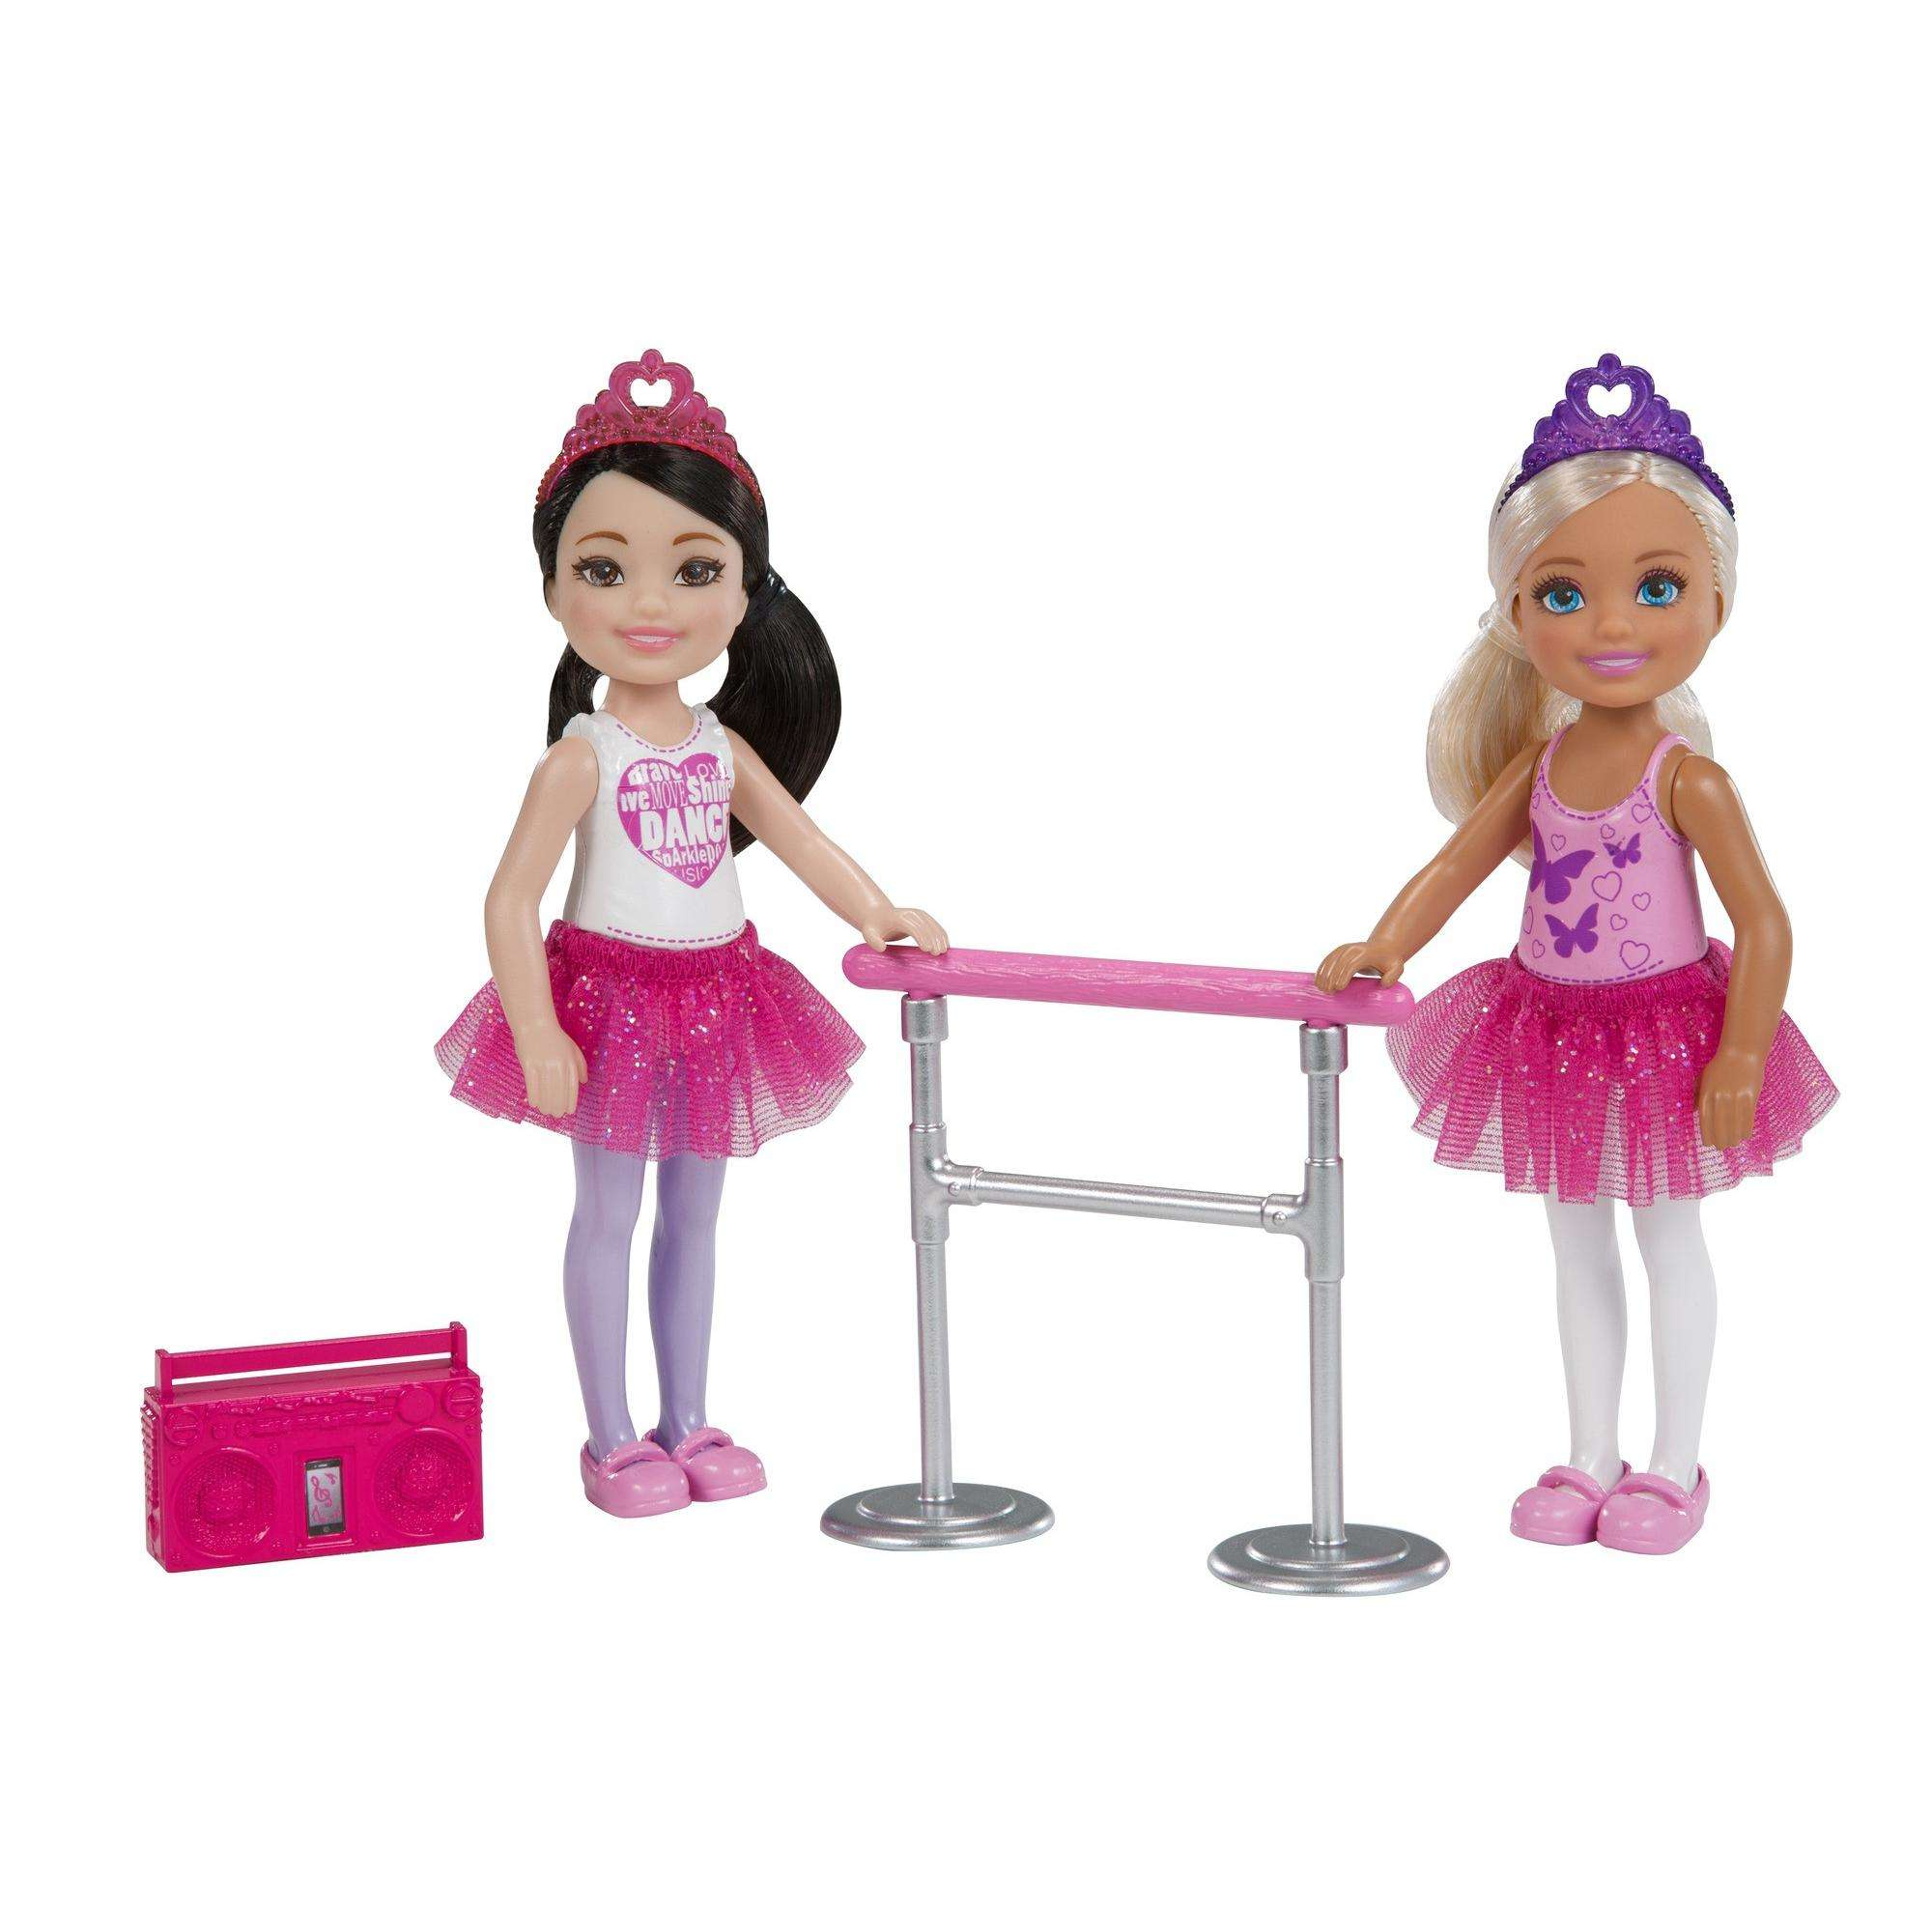 Barbie Chelsea Dolls Dance 2 Pack